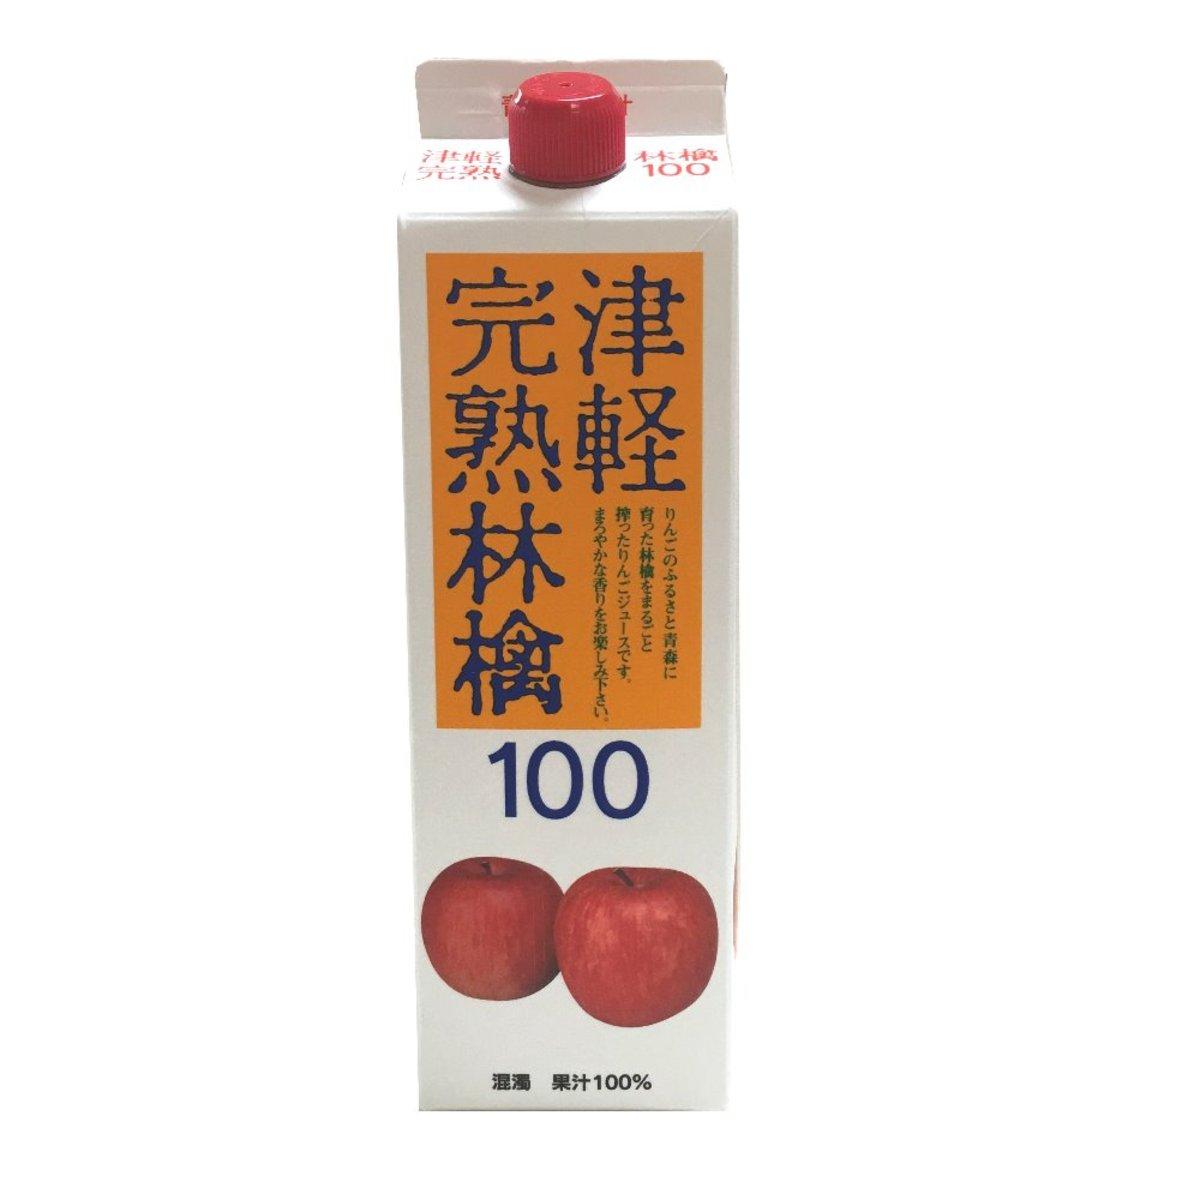 Sterling 津輕完熟林檎100%蘋果汁 1千克